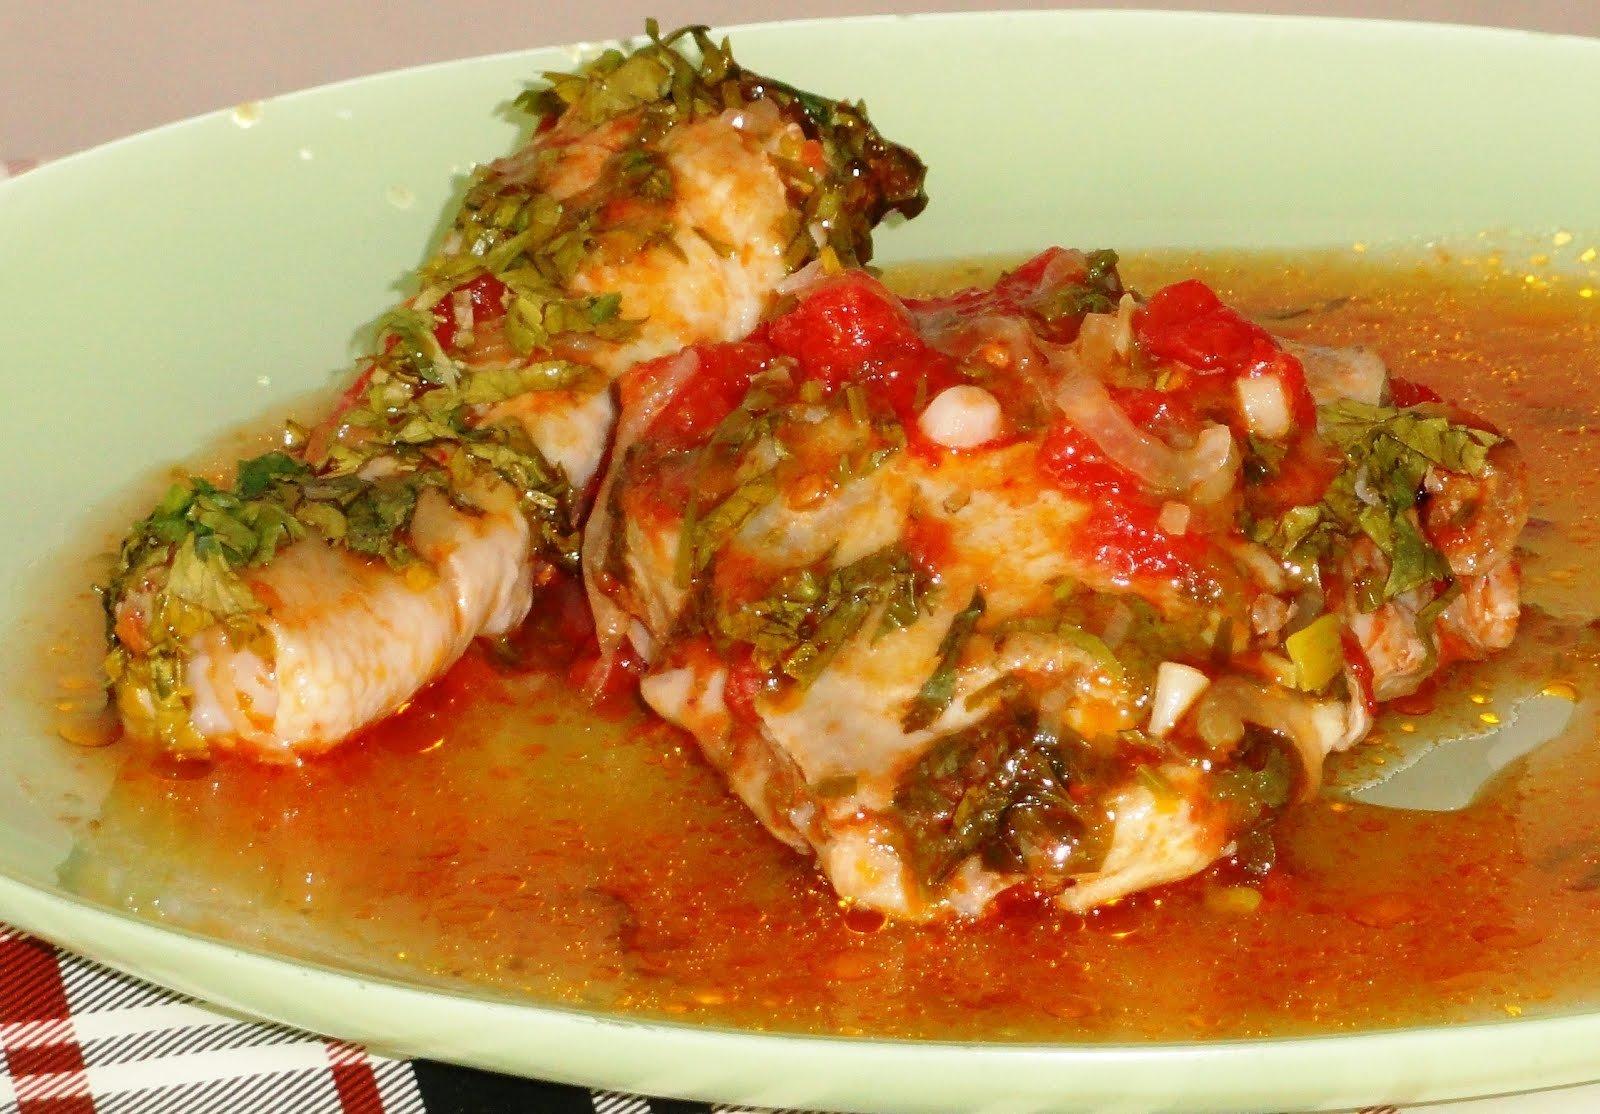 Татарский пирог с изюмом рисом рецепт с